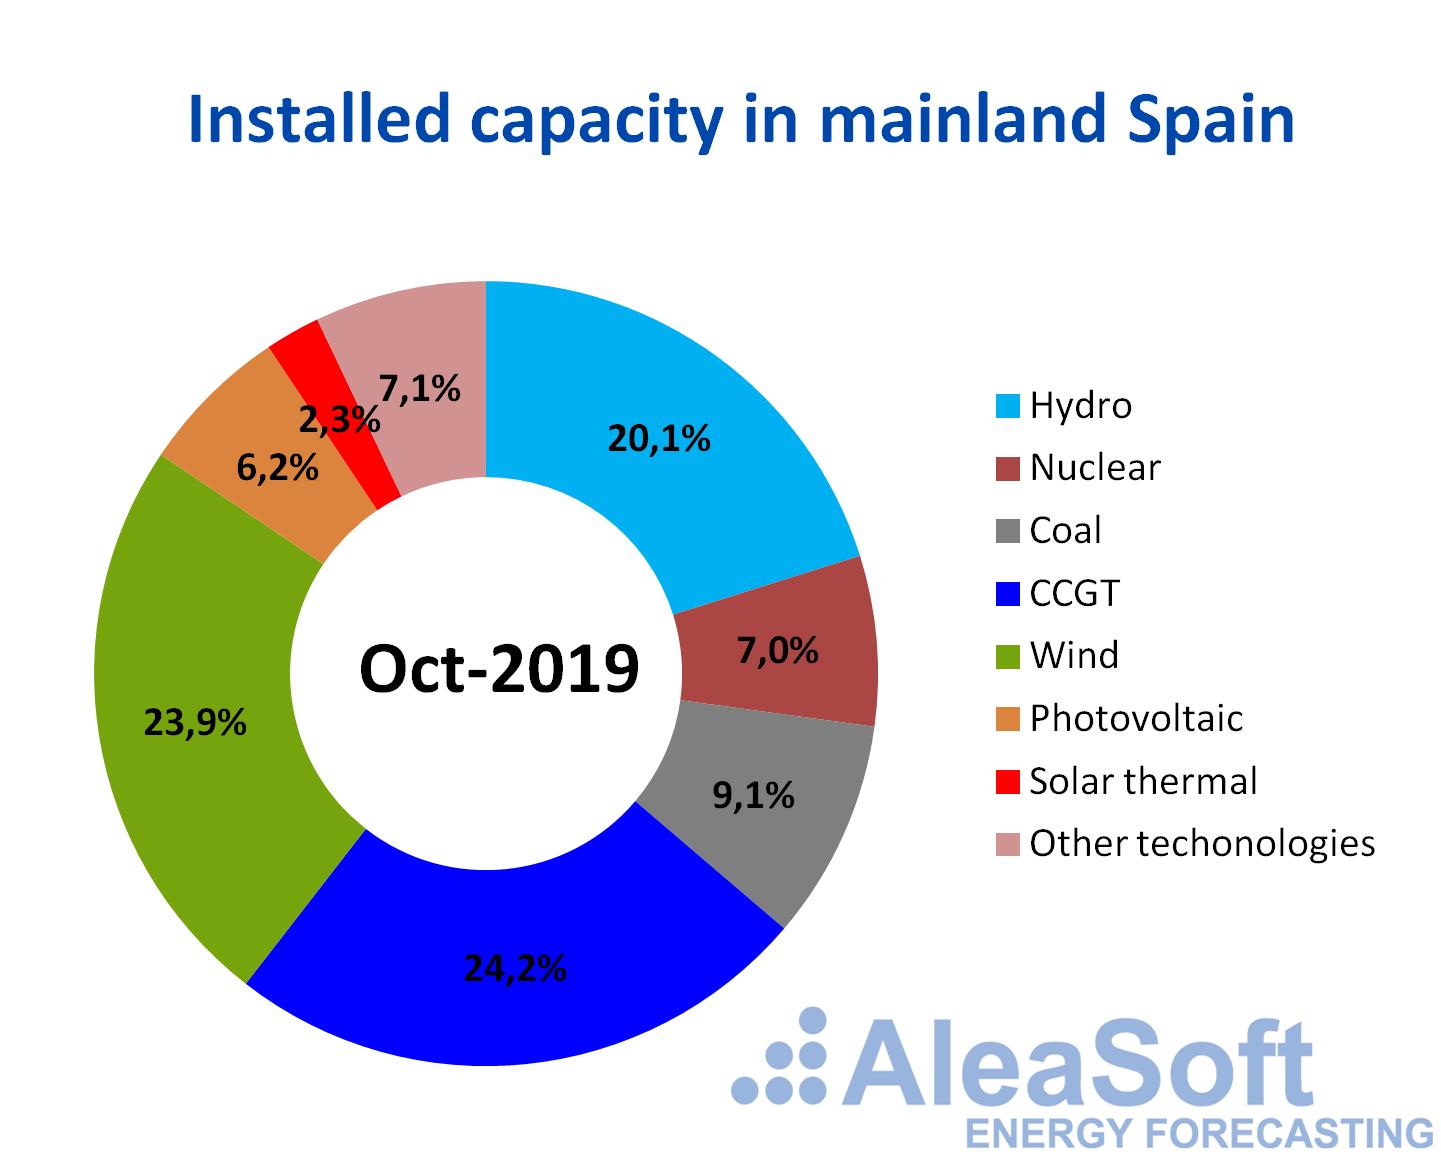 AleaSoft - Installed capacity